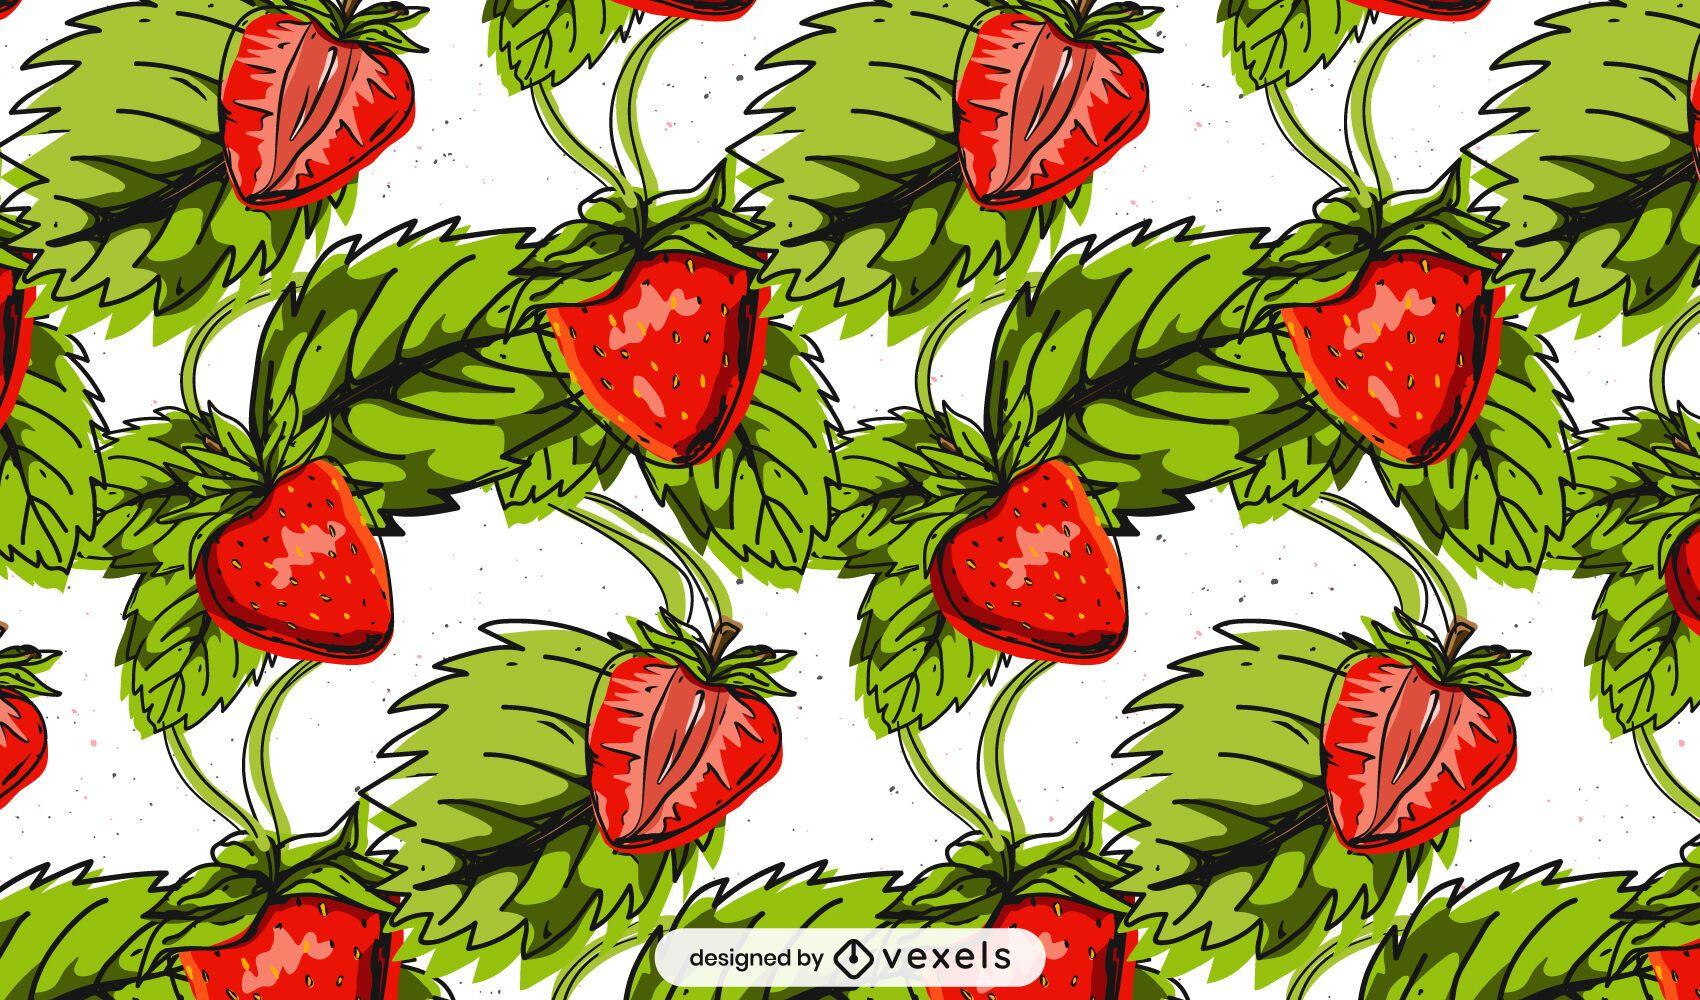 Strawberry leaves pattern design